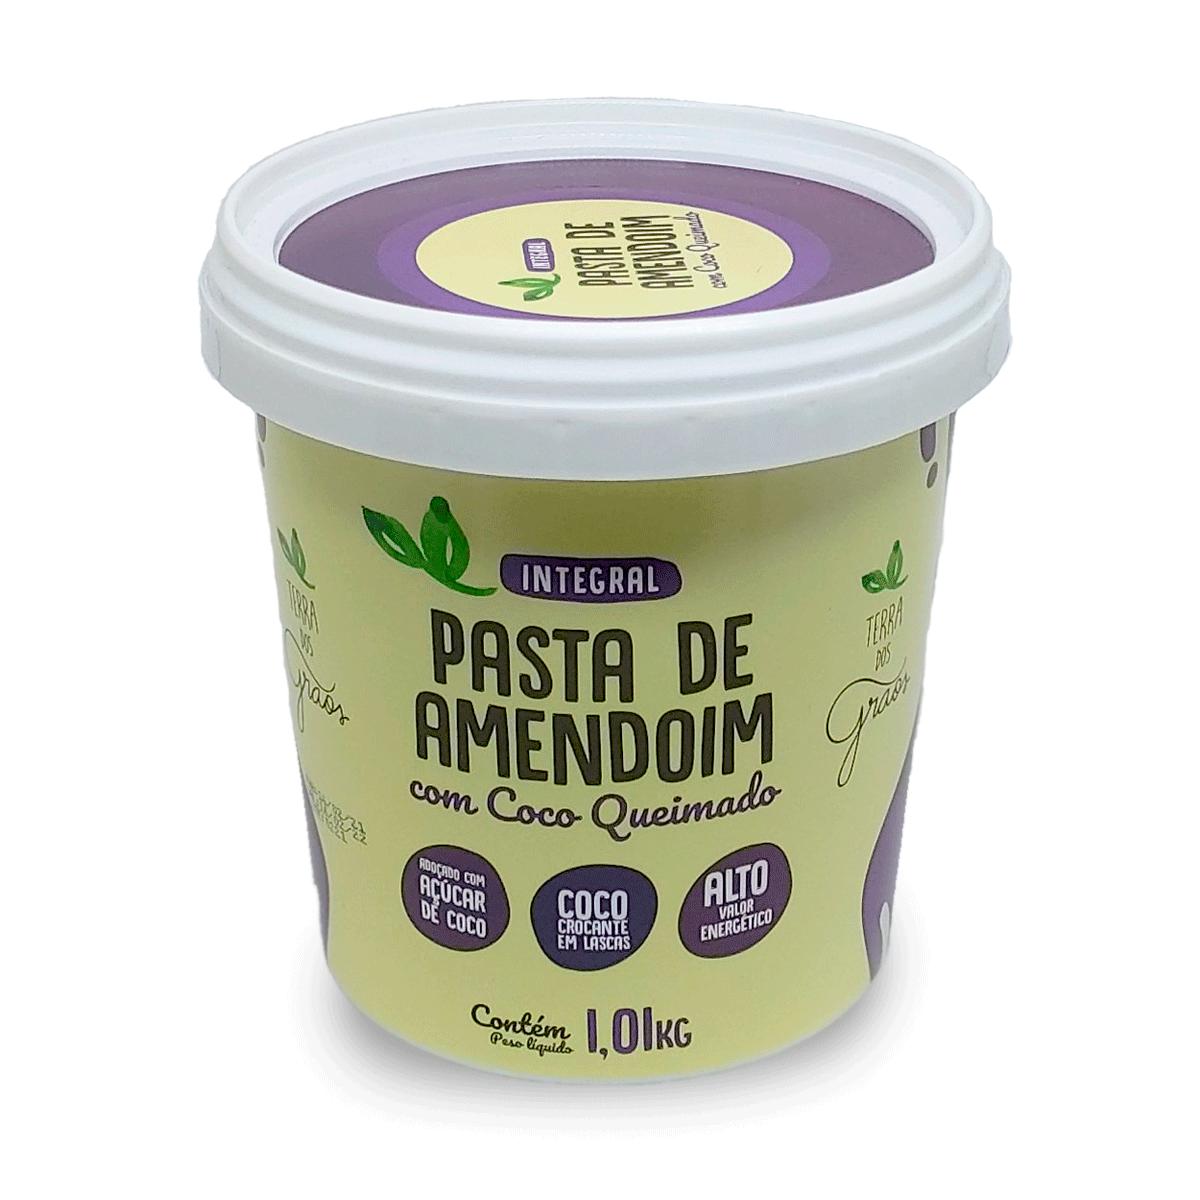 Pasta de Amendoim Coco Queimado 1,01kg